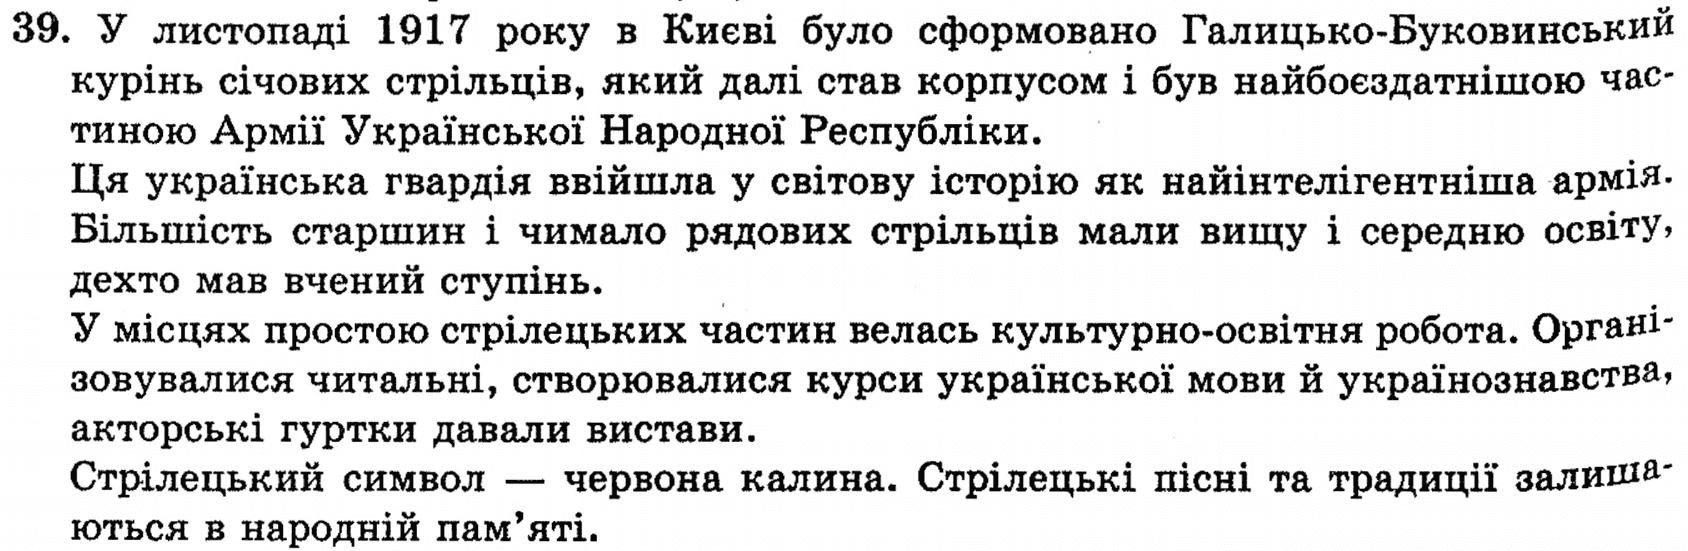 гдз по української мови